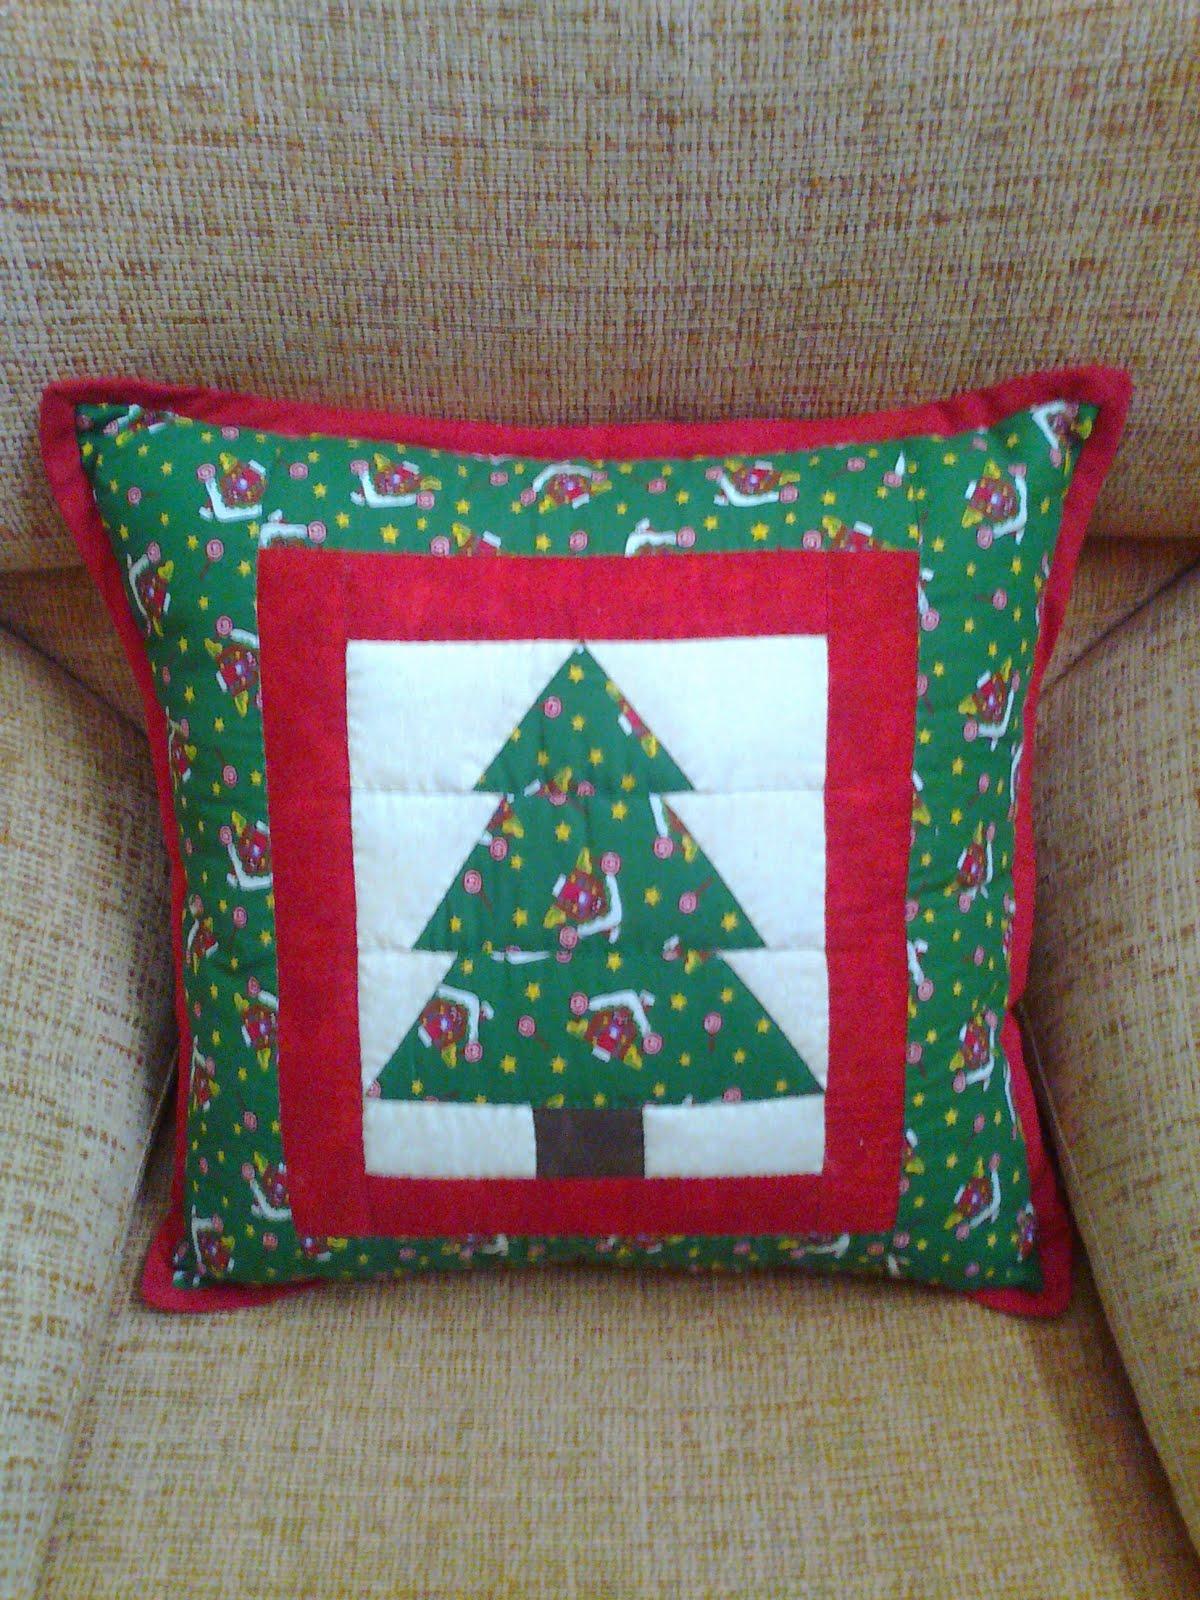 Mari patchwork cojines de navidad ii - Cojines de navidad ...